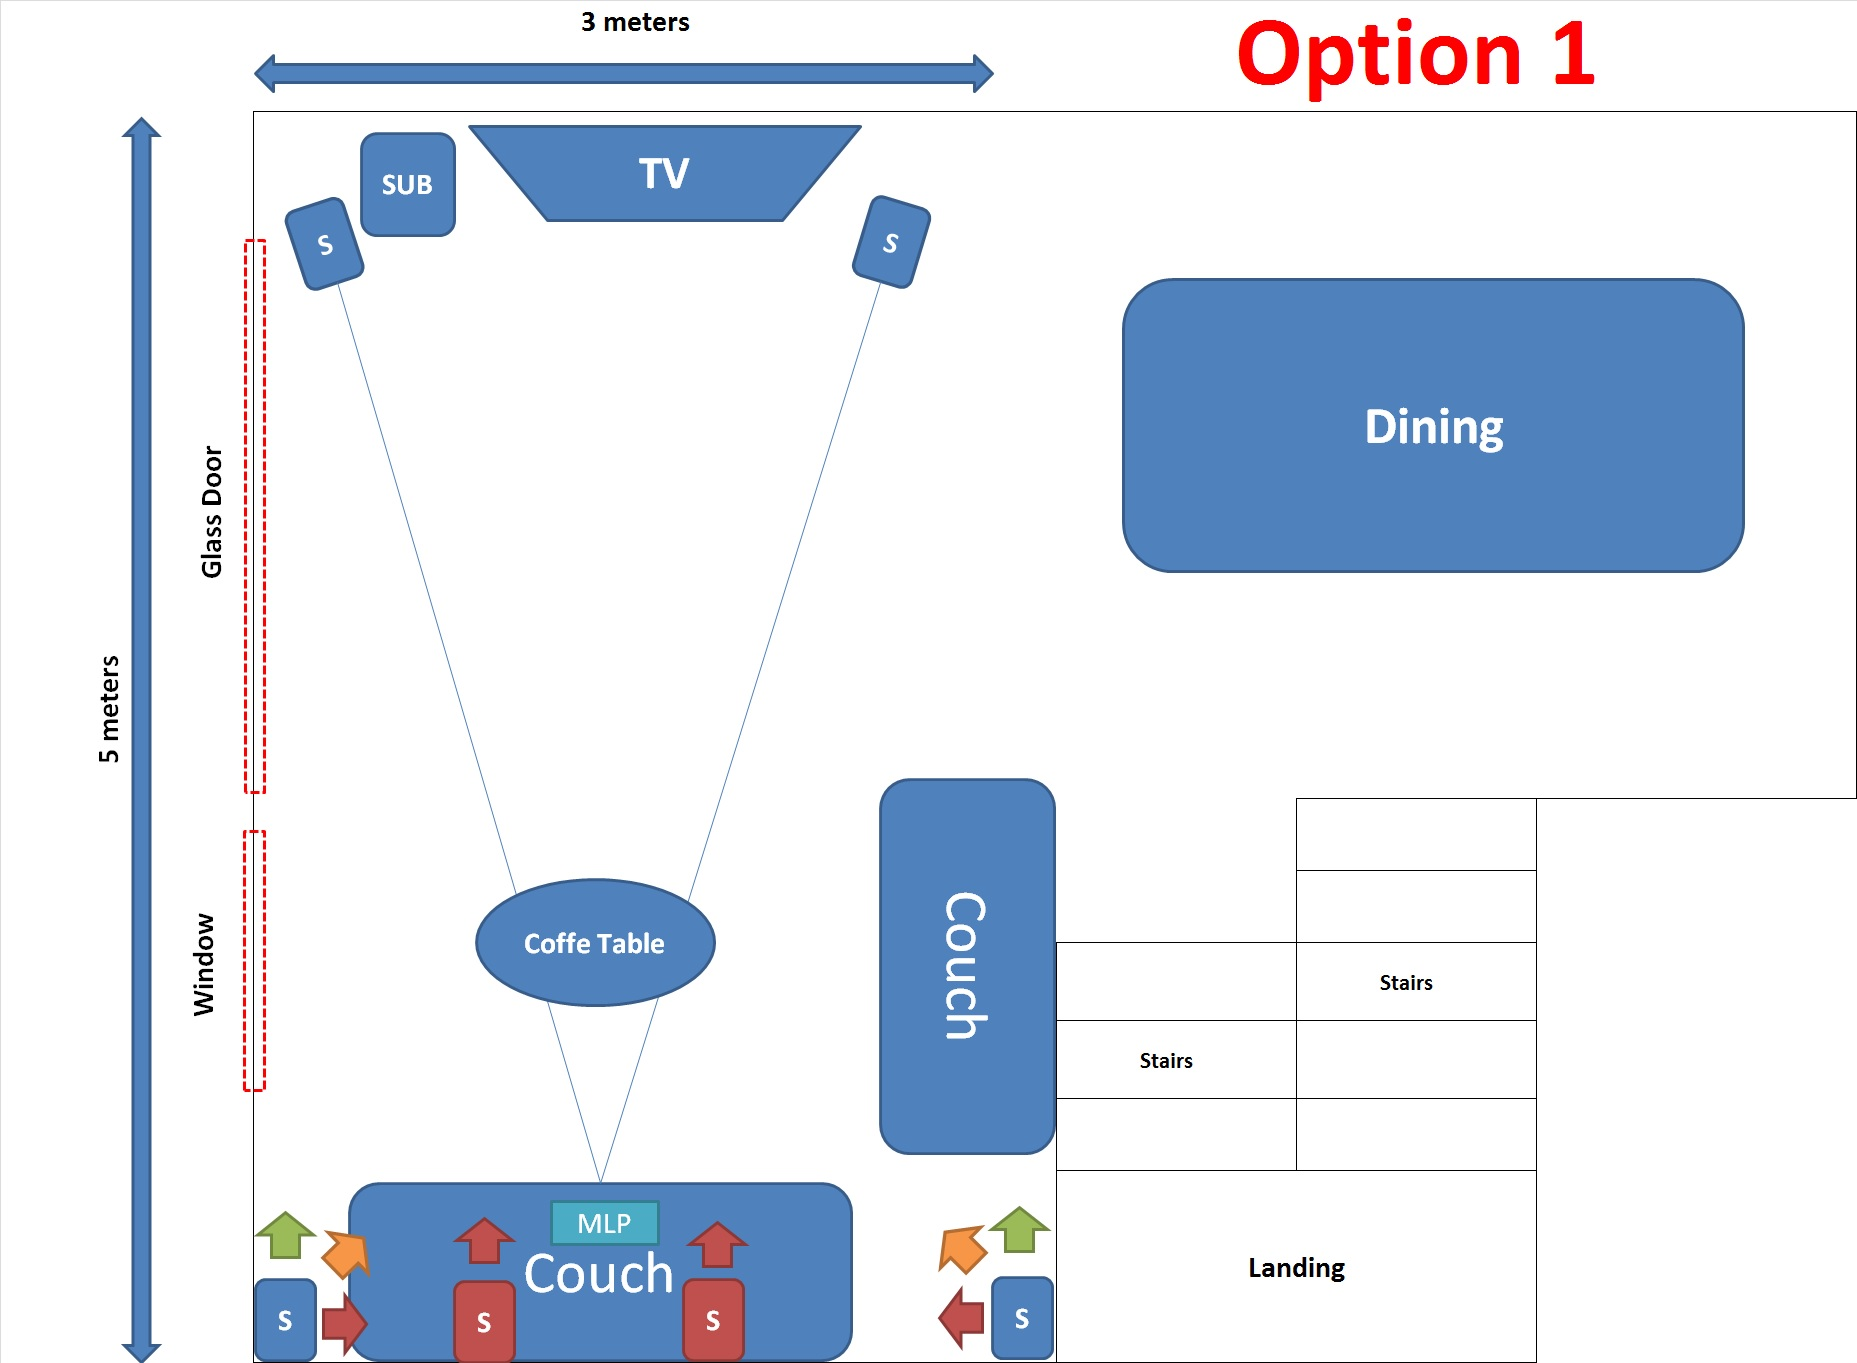 Option 1 jpg